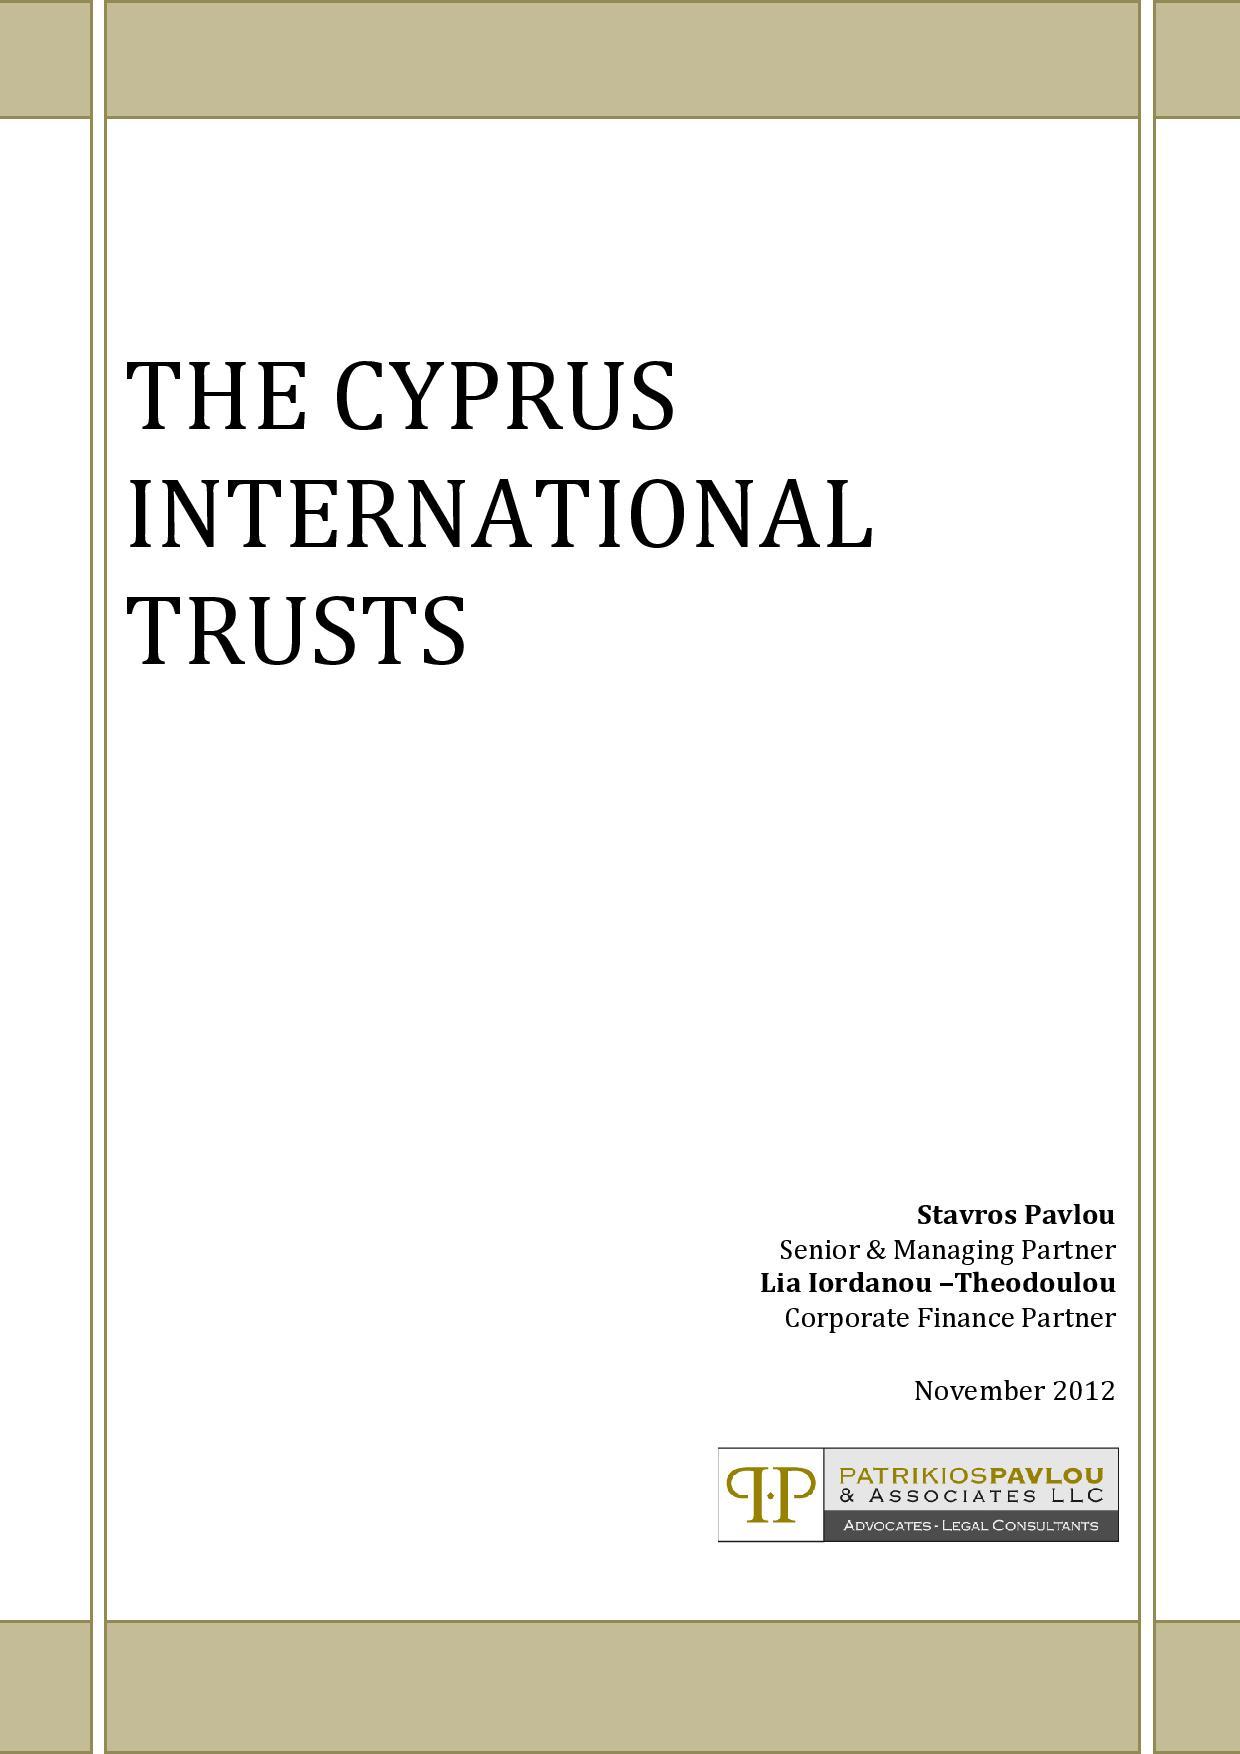 The Cyprus International Trust